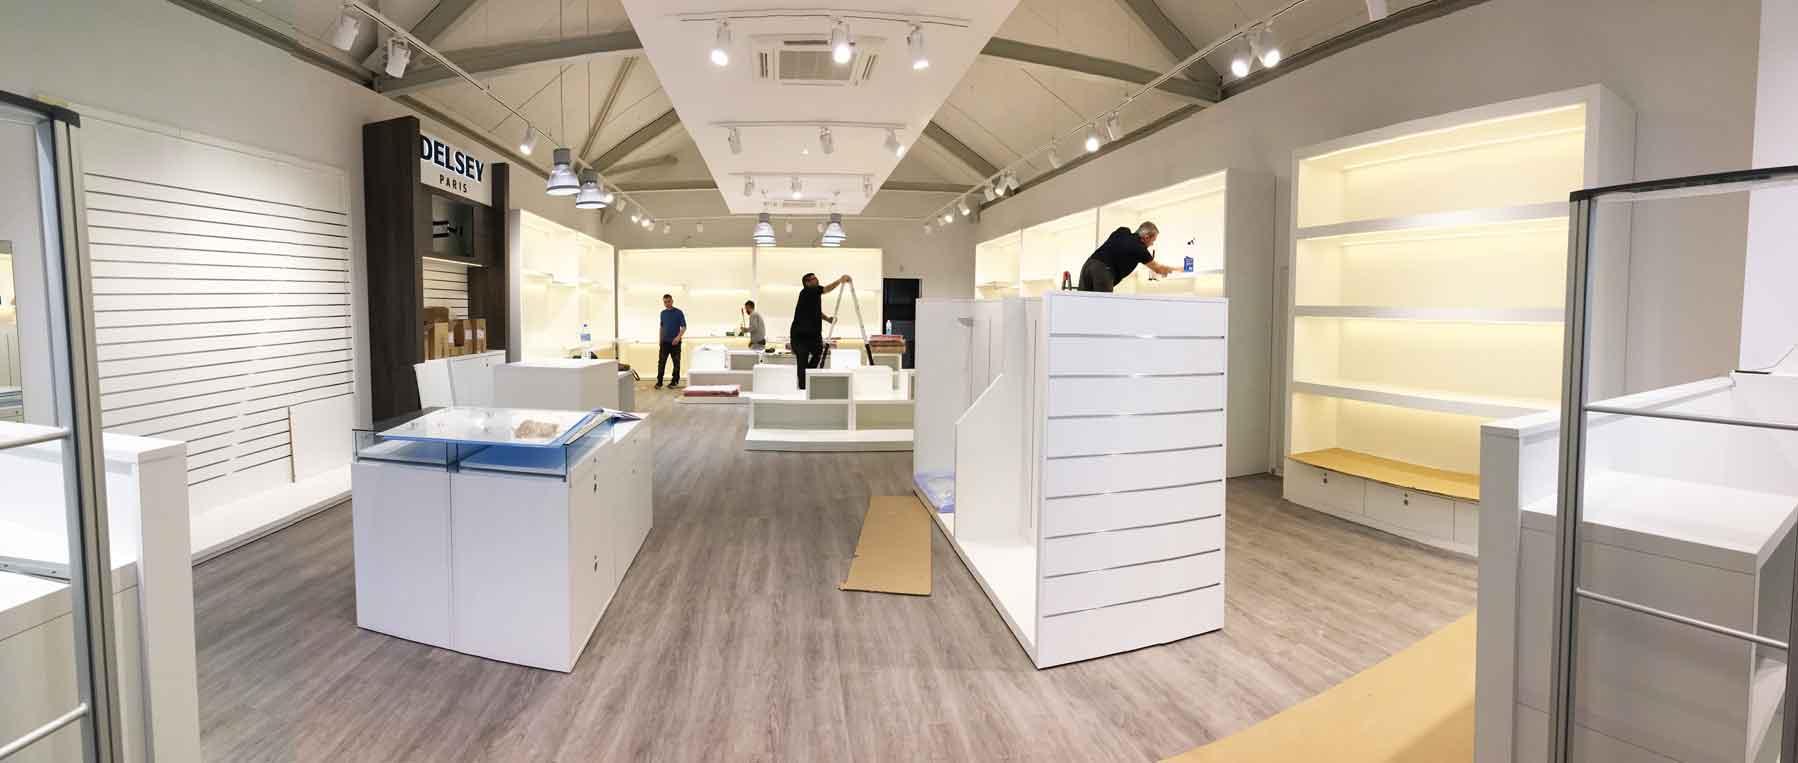 delsey.retail.architecture.03